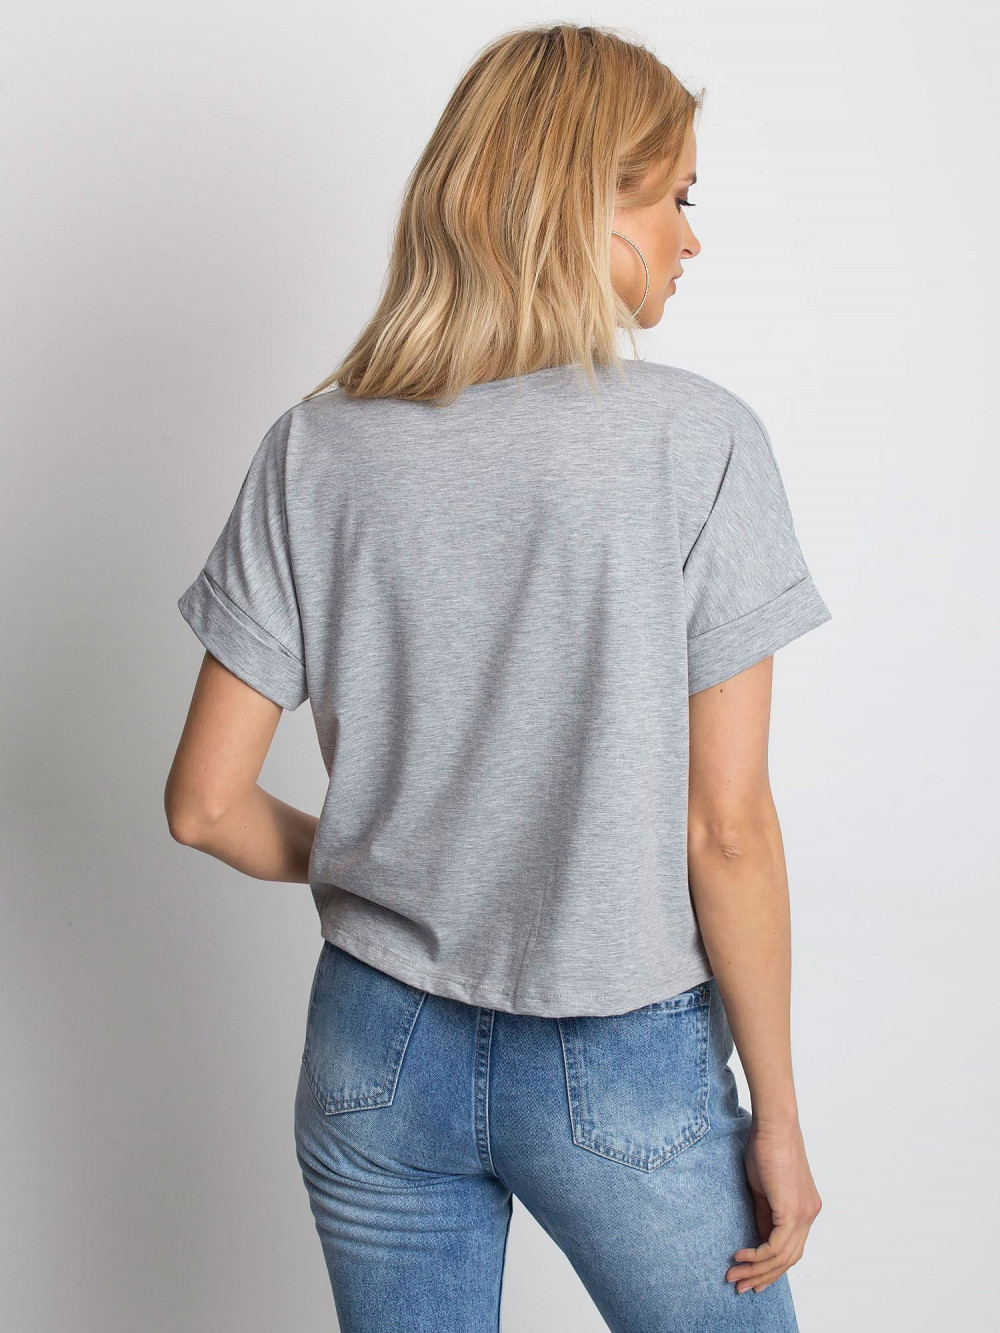 Szary luźny t-shirt Blink 4